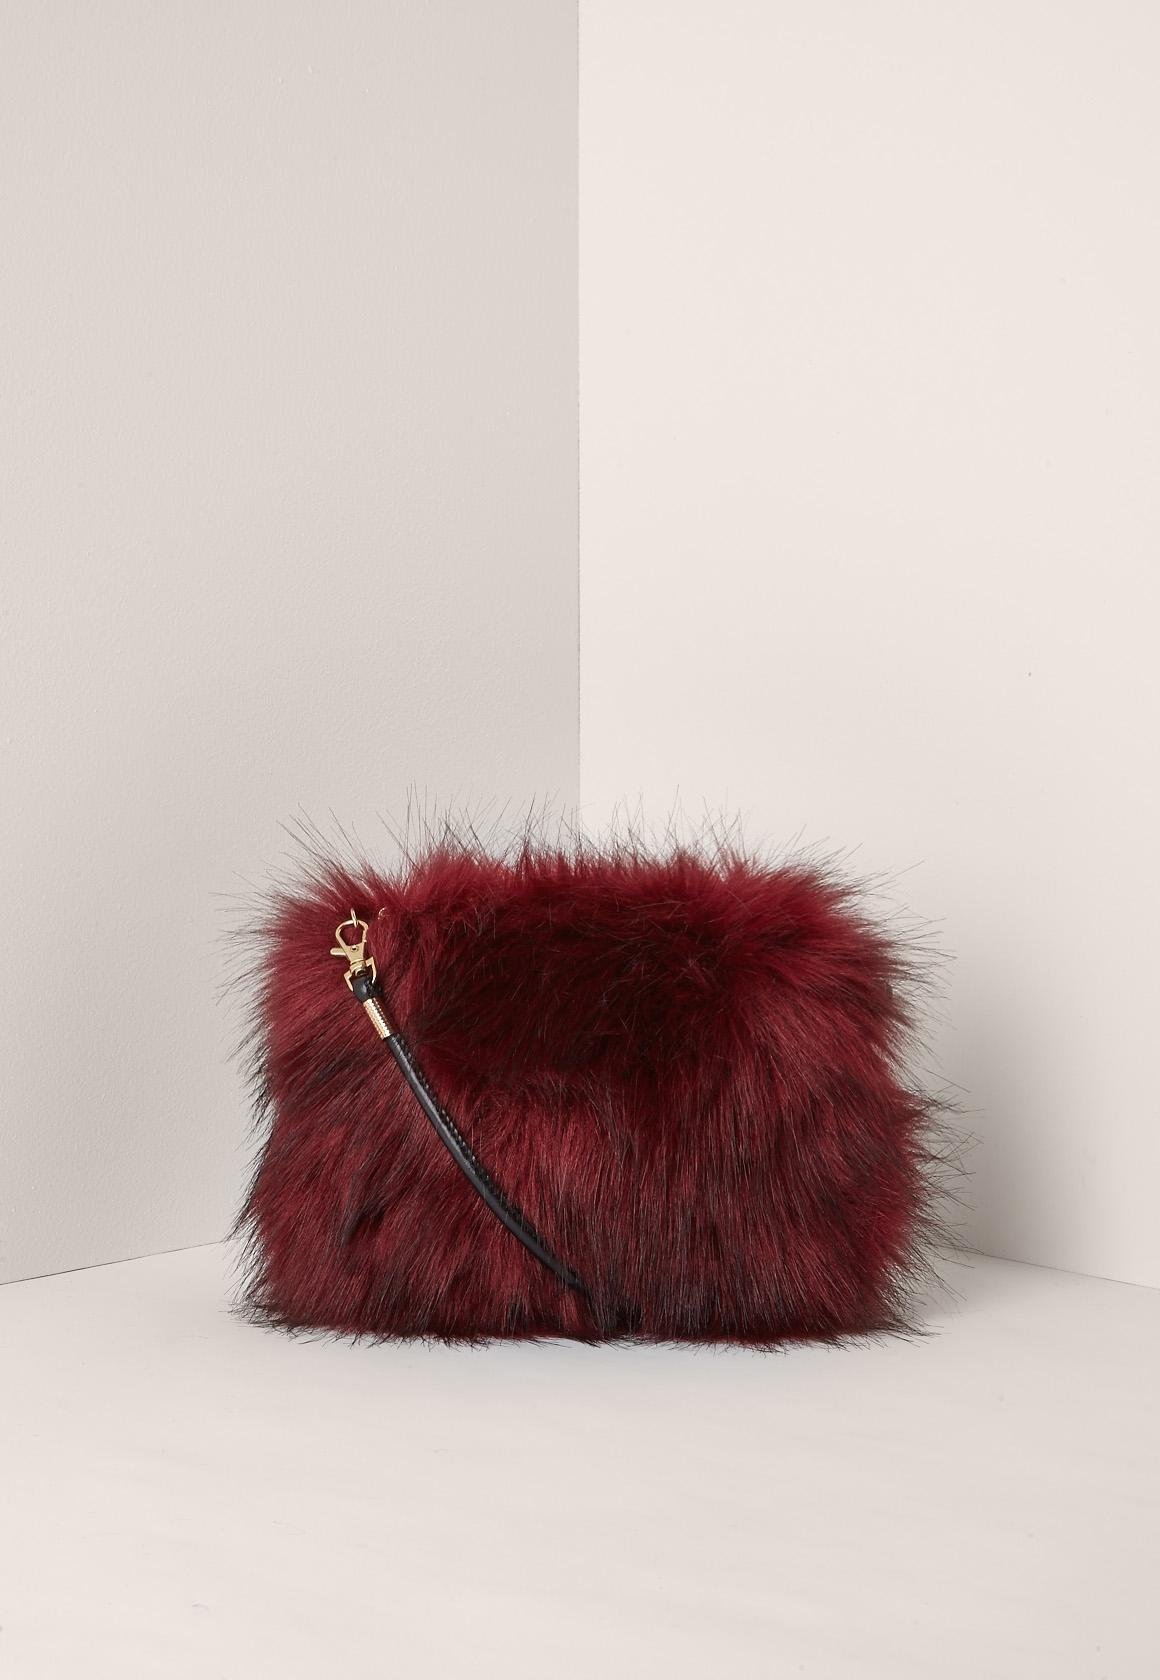 Fur Clutch Purse Best Image Ccdbb